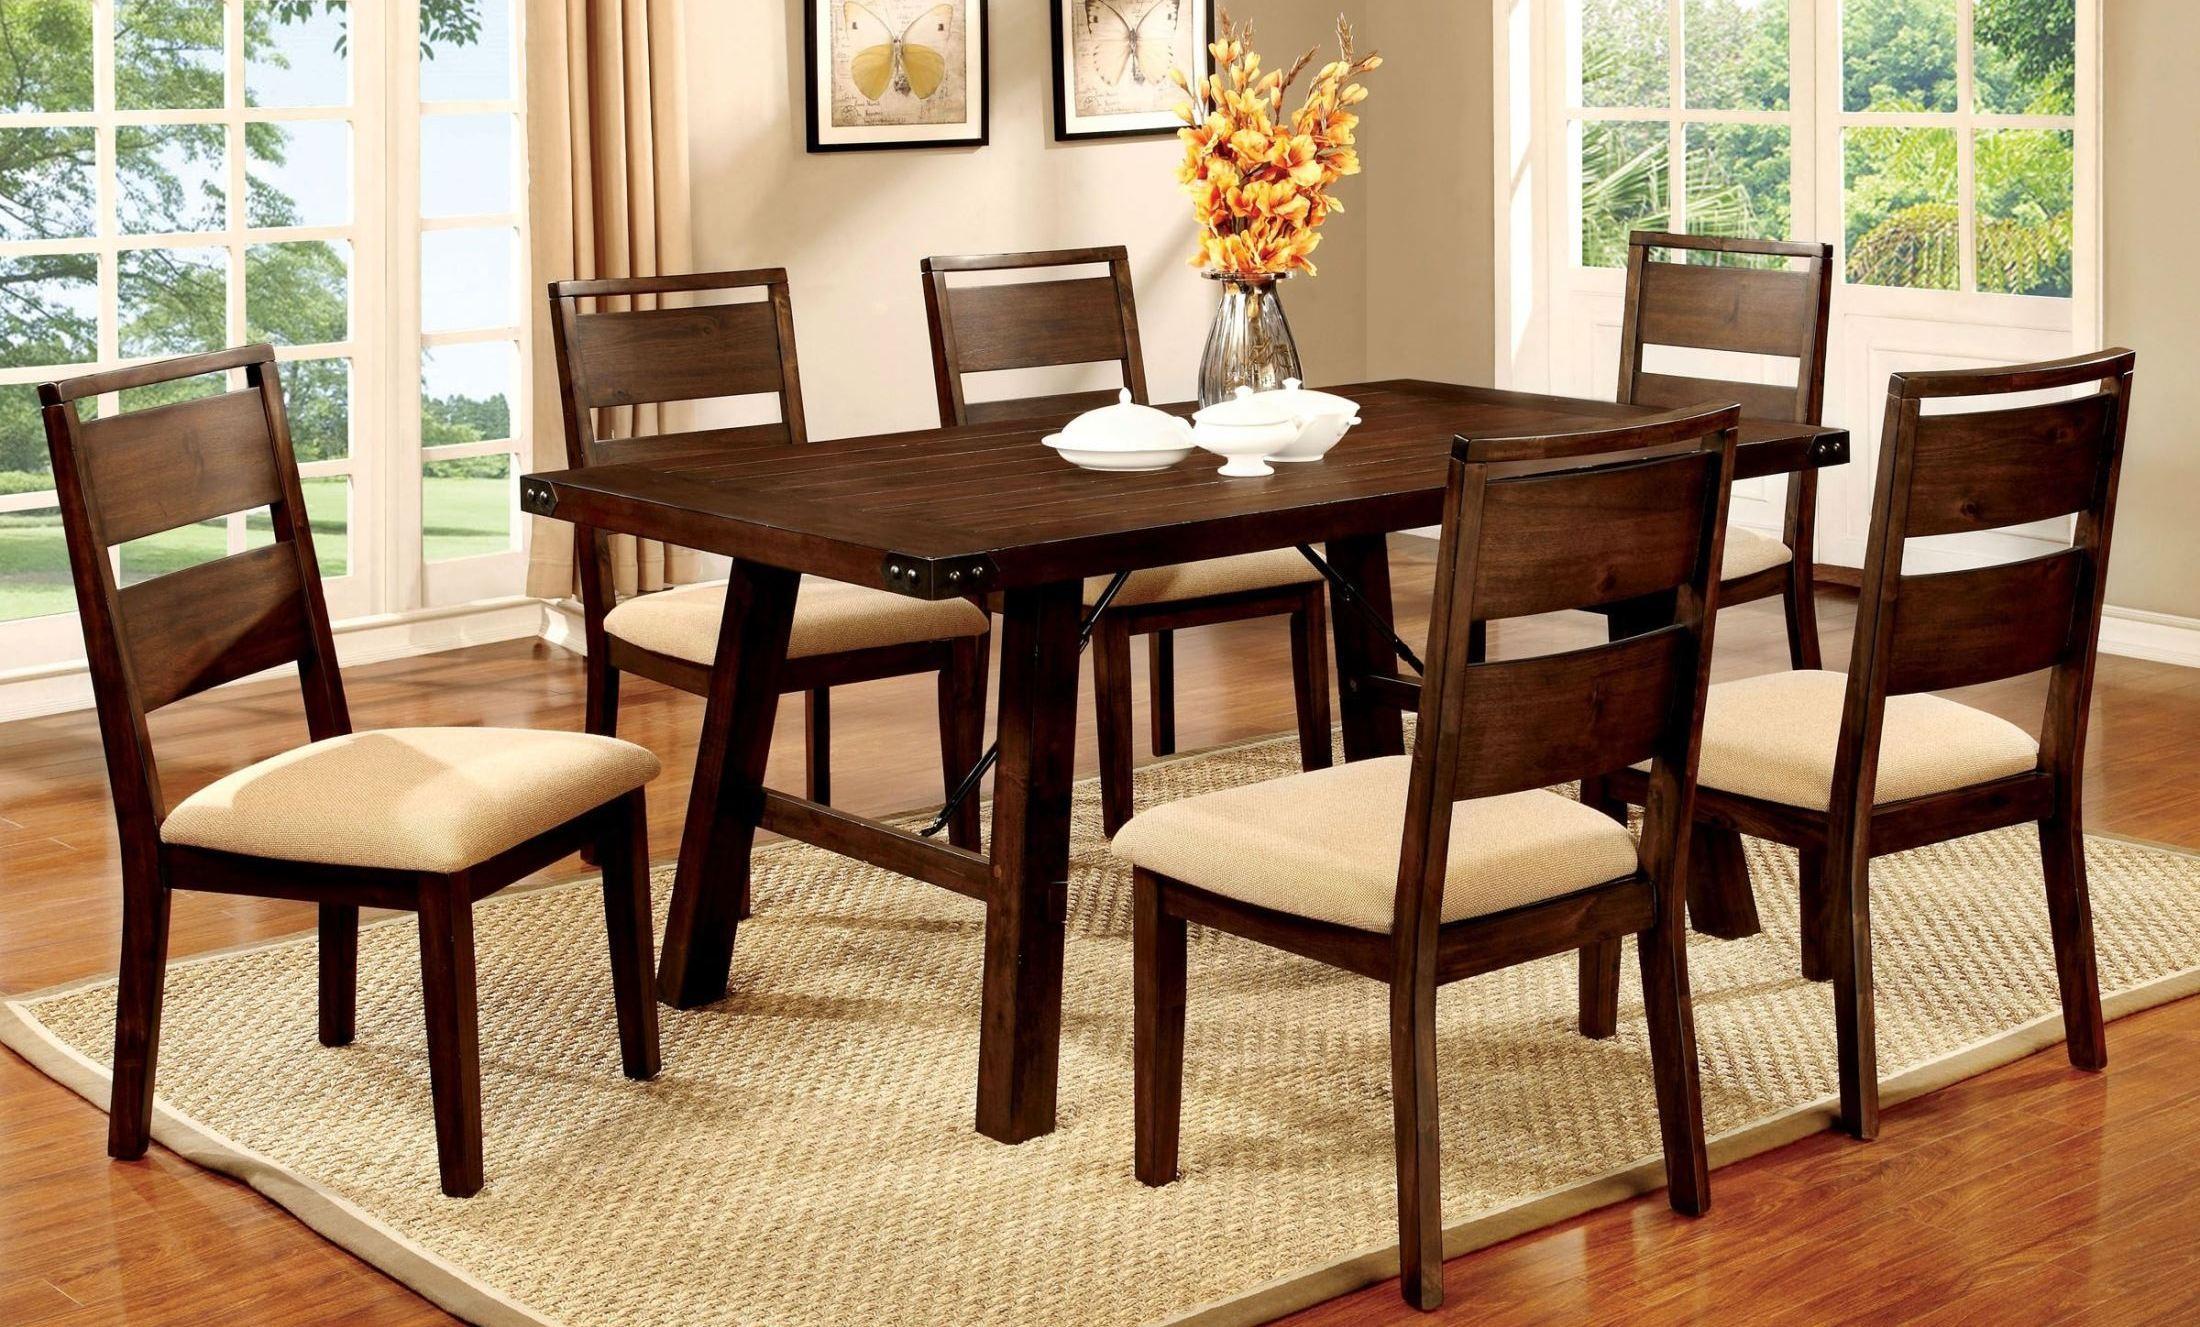 dwight dark oak rectangular dining room set from furniture of america cm3915t table coleman. Black Bedroom Furniture Sets. Home Design Ideas